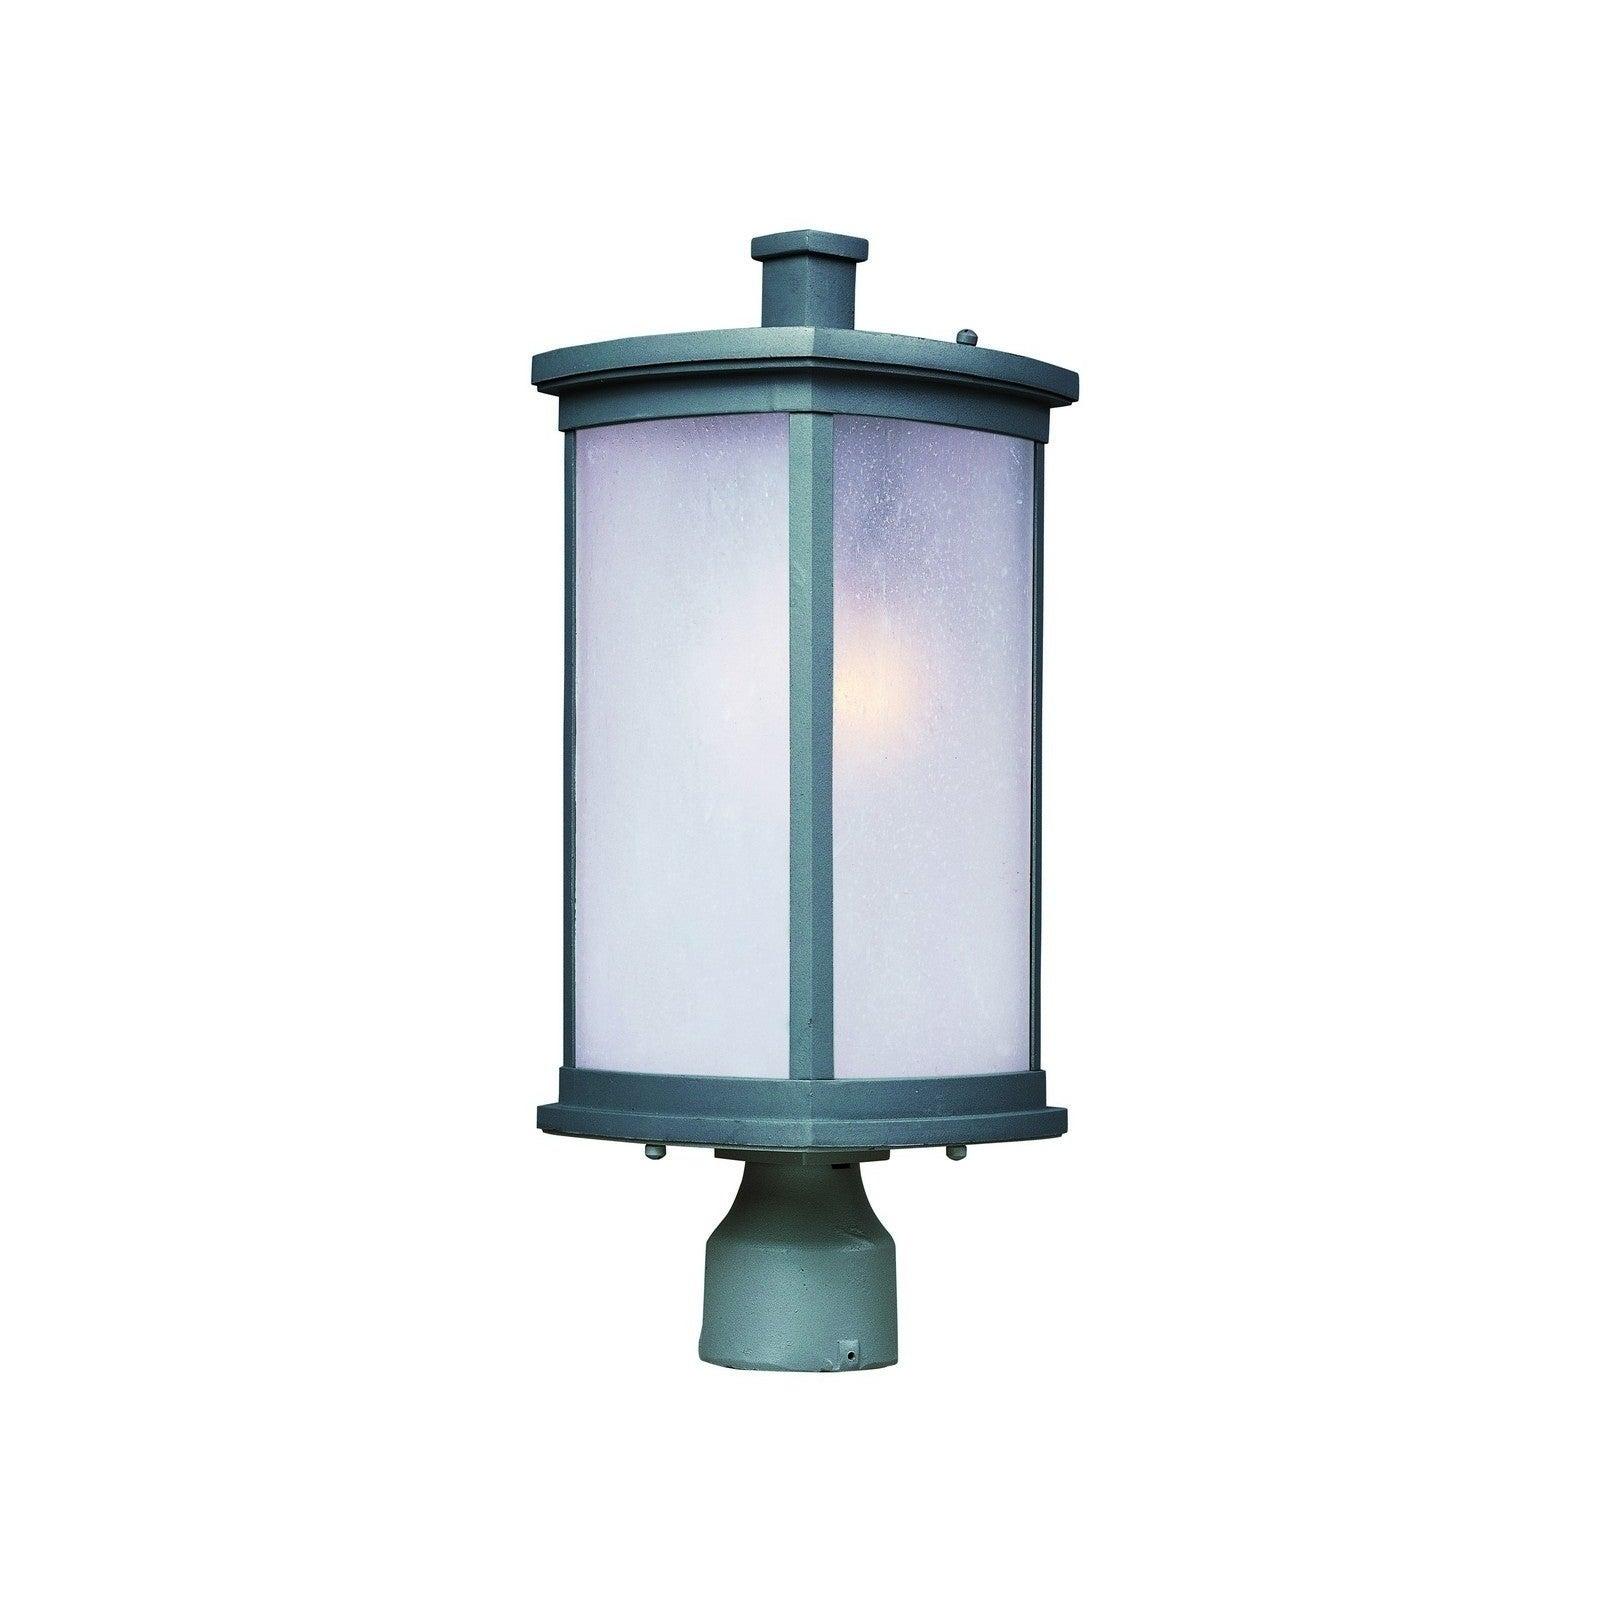 Maxim Lighting Terrace 1-light Outdoor Pole/ Post Mount (...